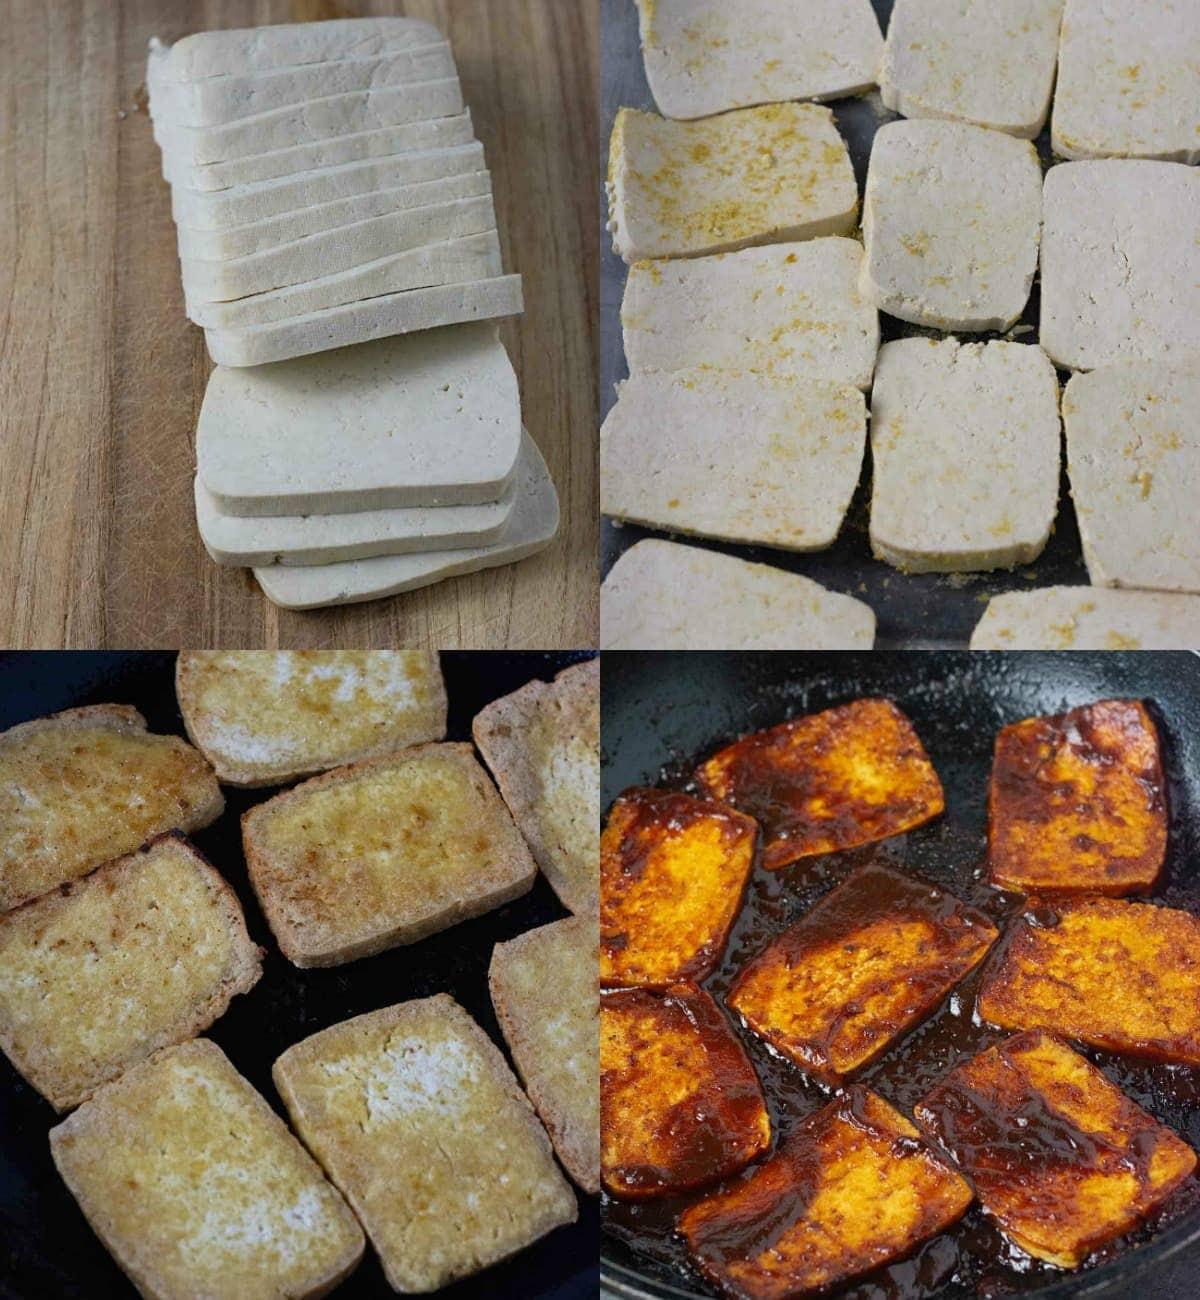 Step by step barbecue tofu images, tofu slices, seasoned slices, fried tofu and barbecue sauce tofu